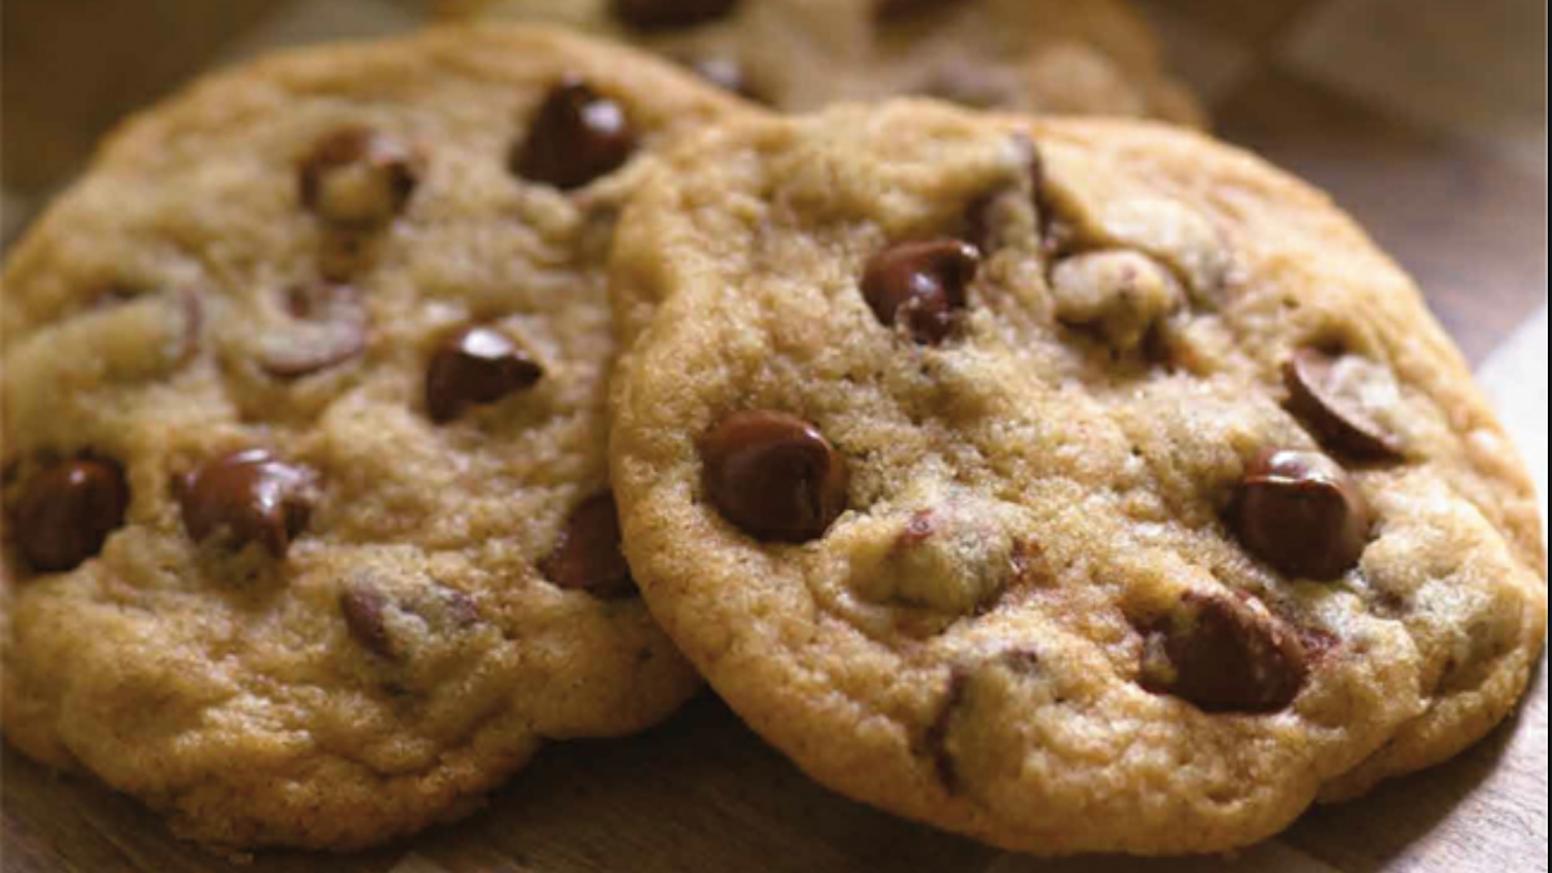 World's Best Chocolate Chip Cookies! by Jay Gallaher — Kickstarter